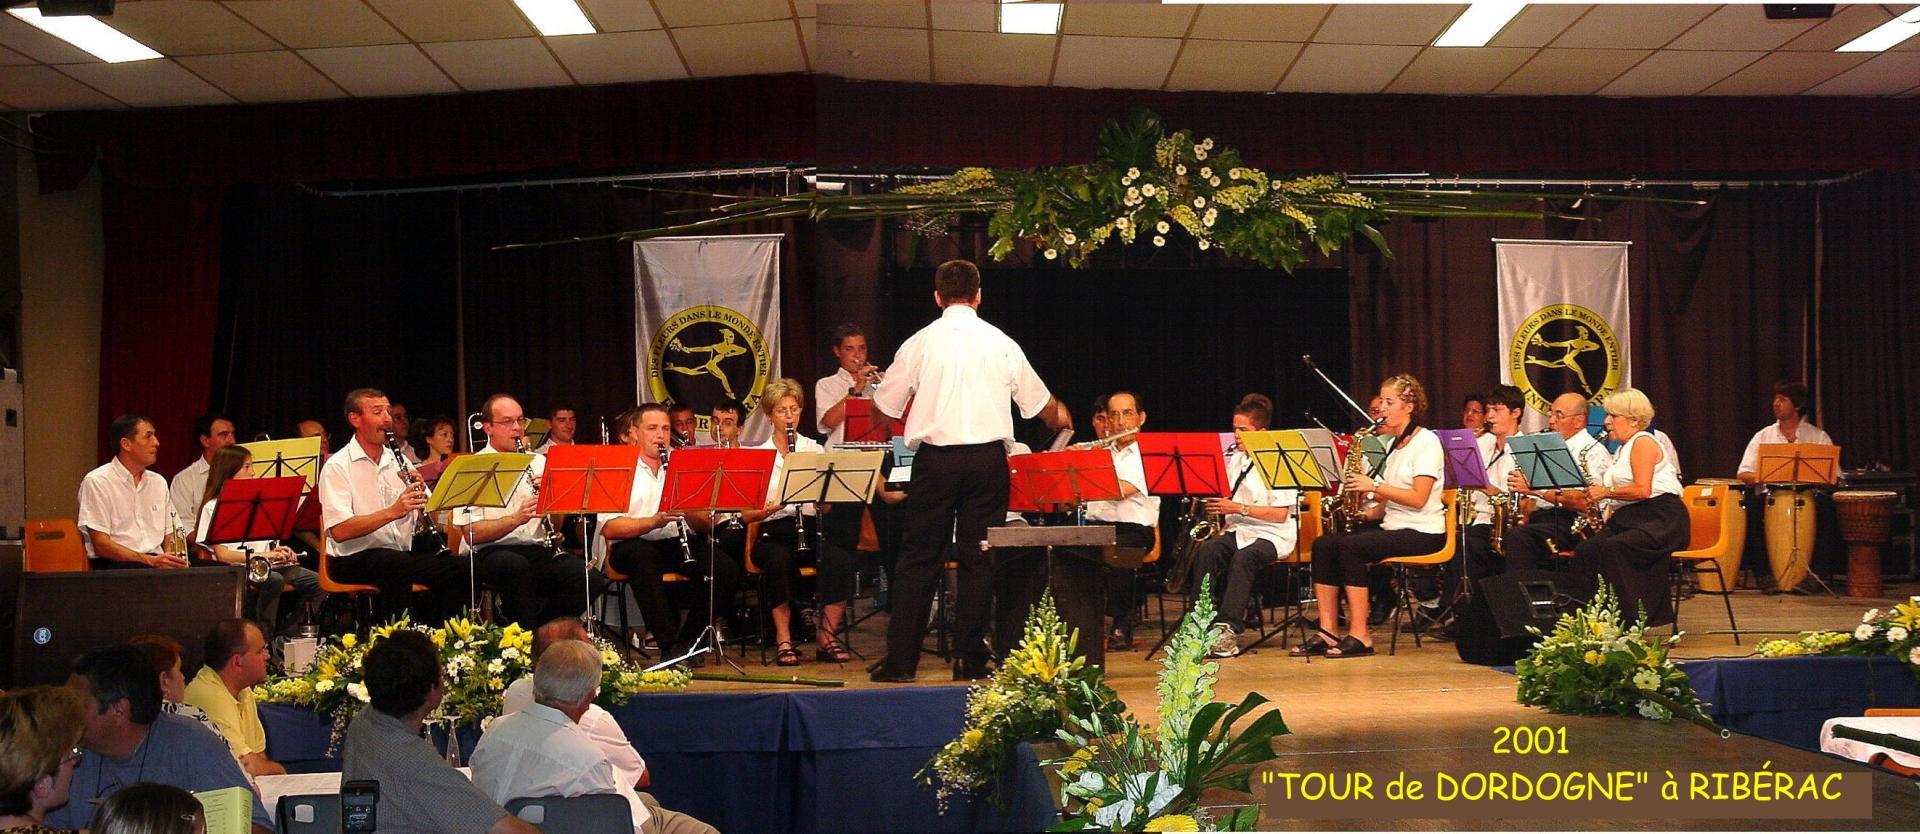 2001 tour dordogne1 2